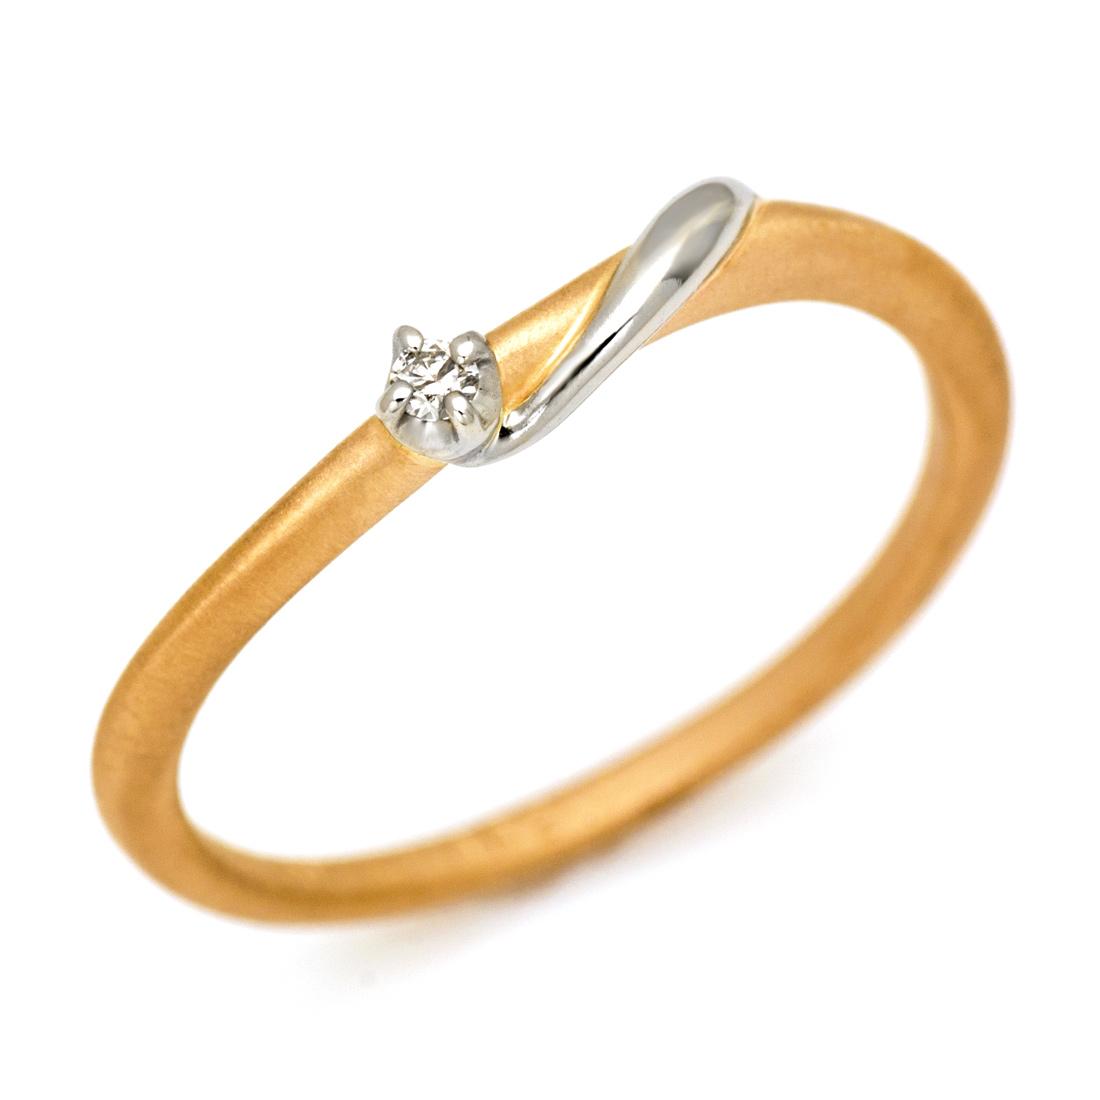 K18/PT900 ダイヤモンド リング 「mebae」GINGER掲載 ピンキーリング 指輪 ダイアモンド ファランジ 18K 18金 ゴールド 4月誕生石 誕生日 記念日 新生活 刻印 文字入れ